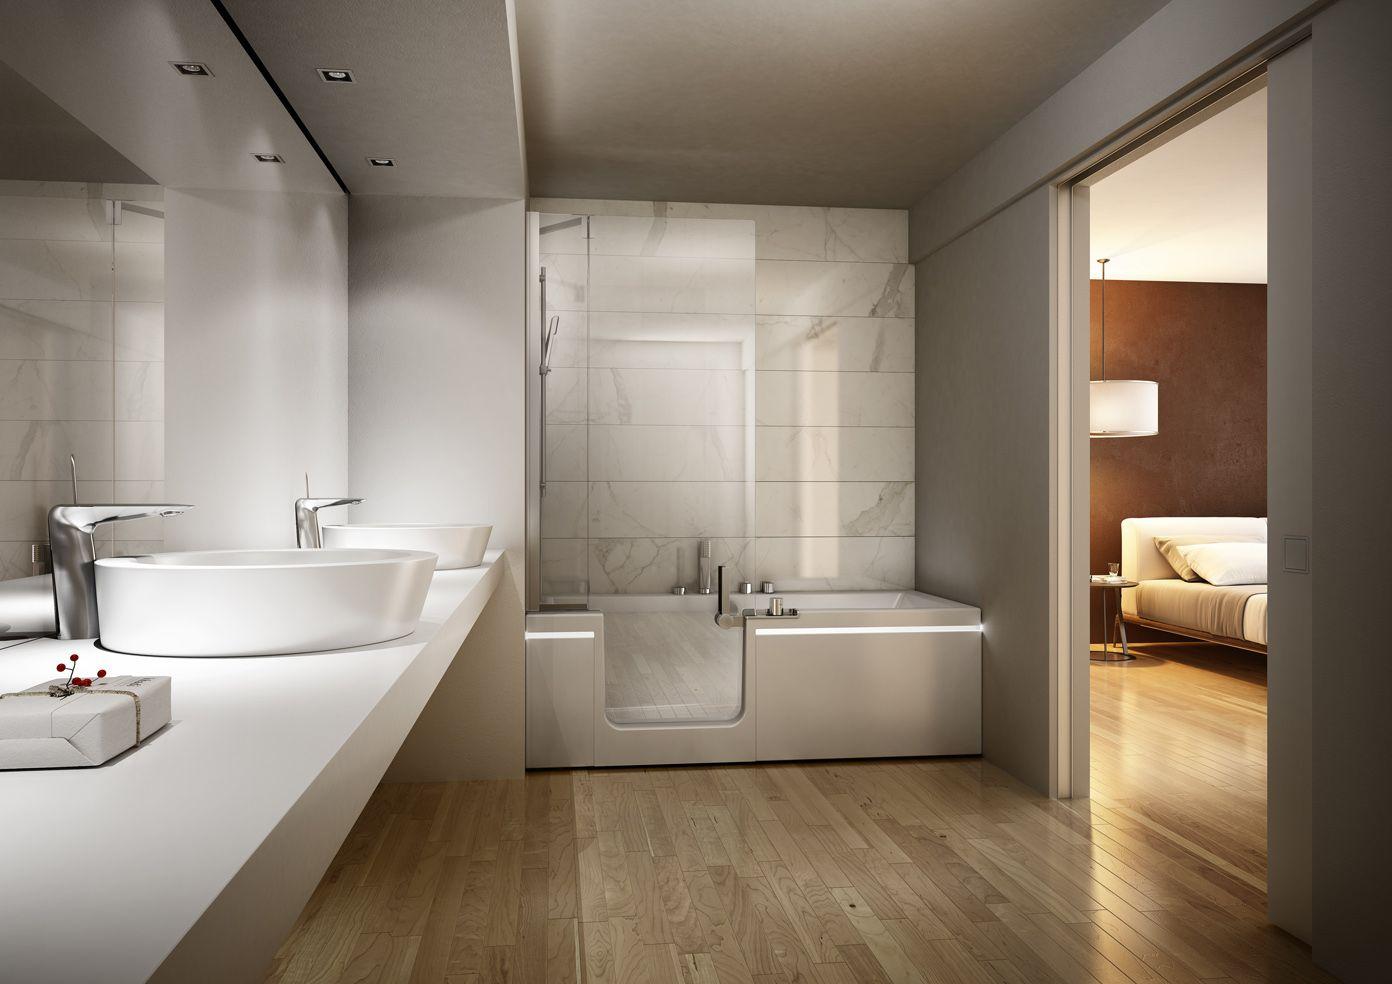 Combination Badgestaltung Badezimmer Design Badezimmerideen